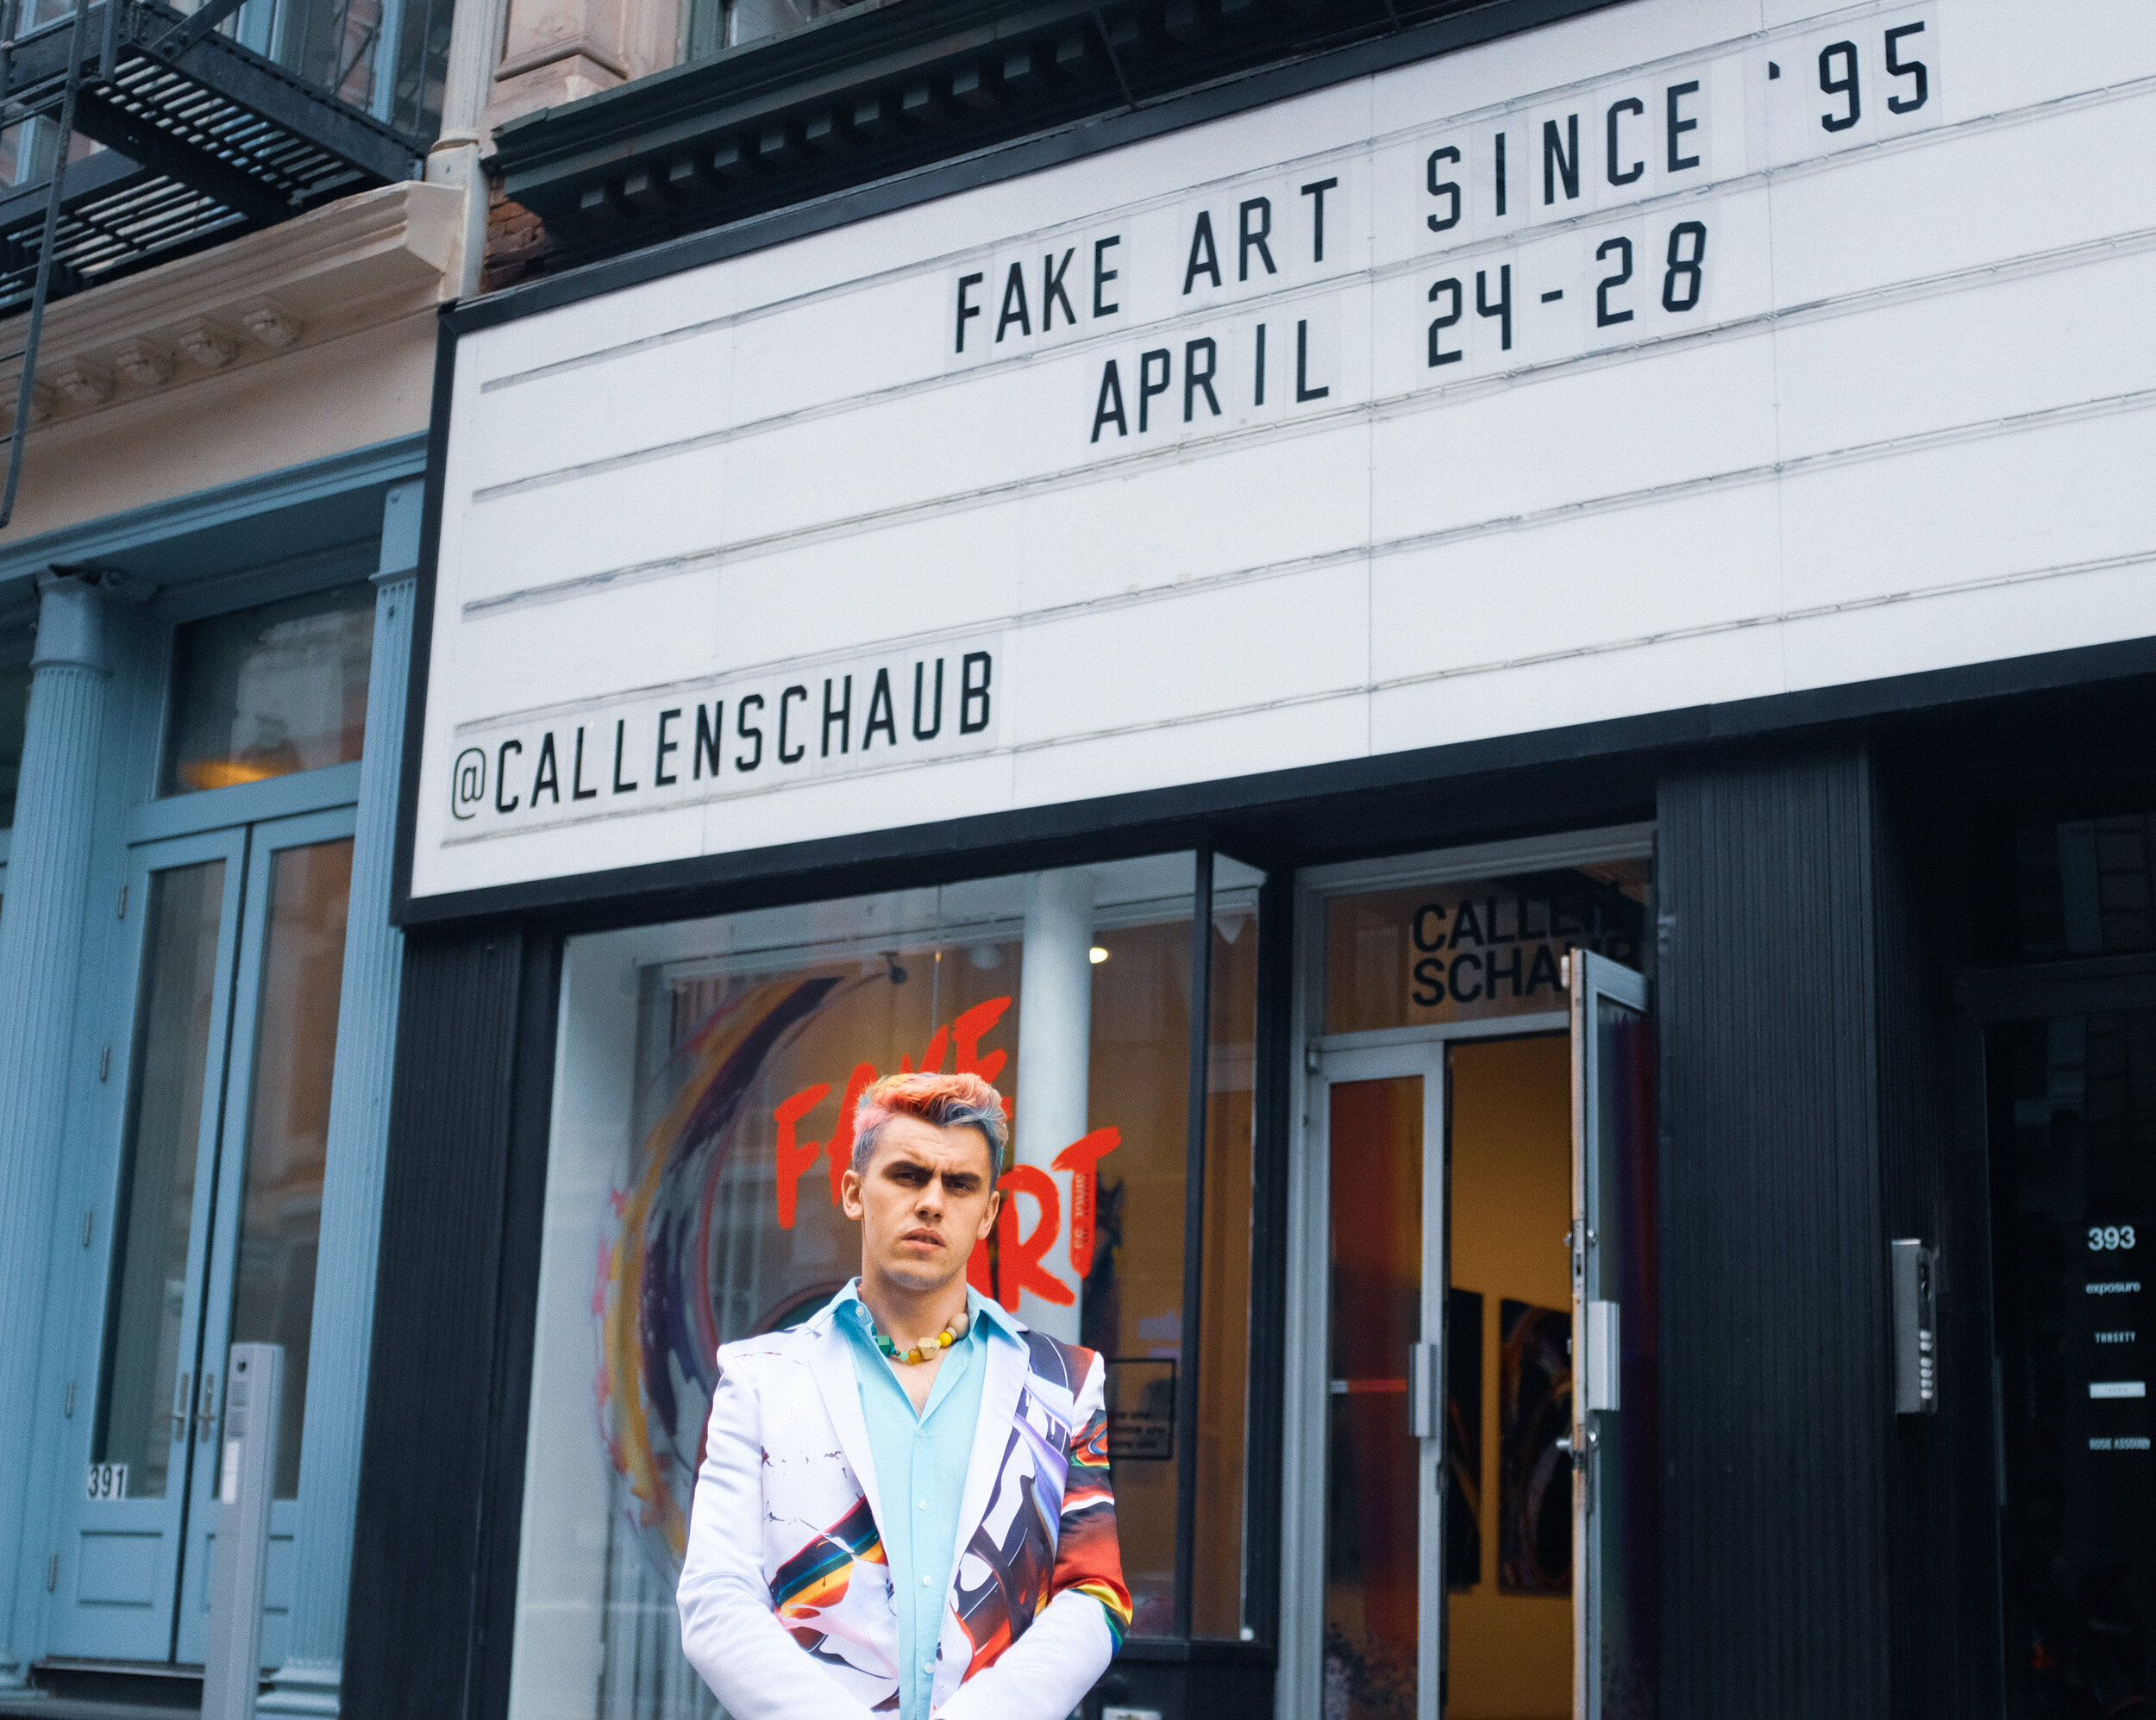 callen shaub fine fake art